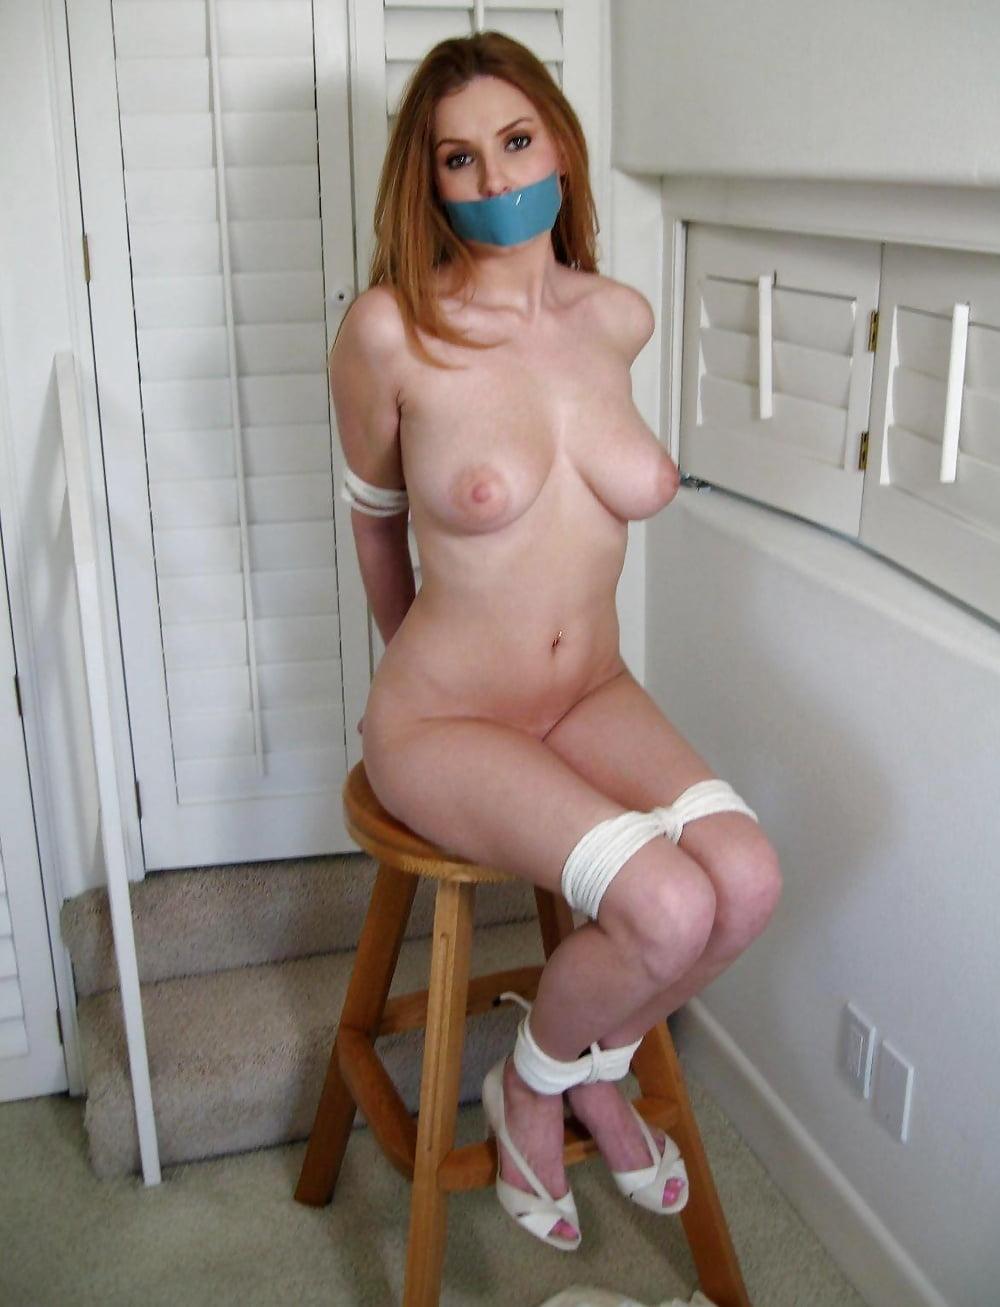 Cfnm Girls Embarrassed Naked Boys